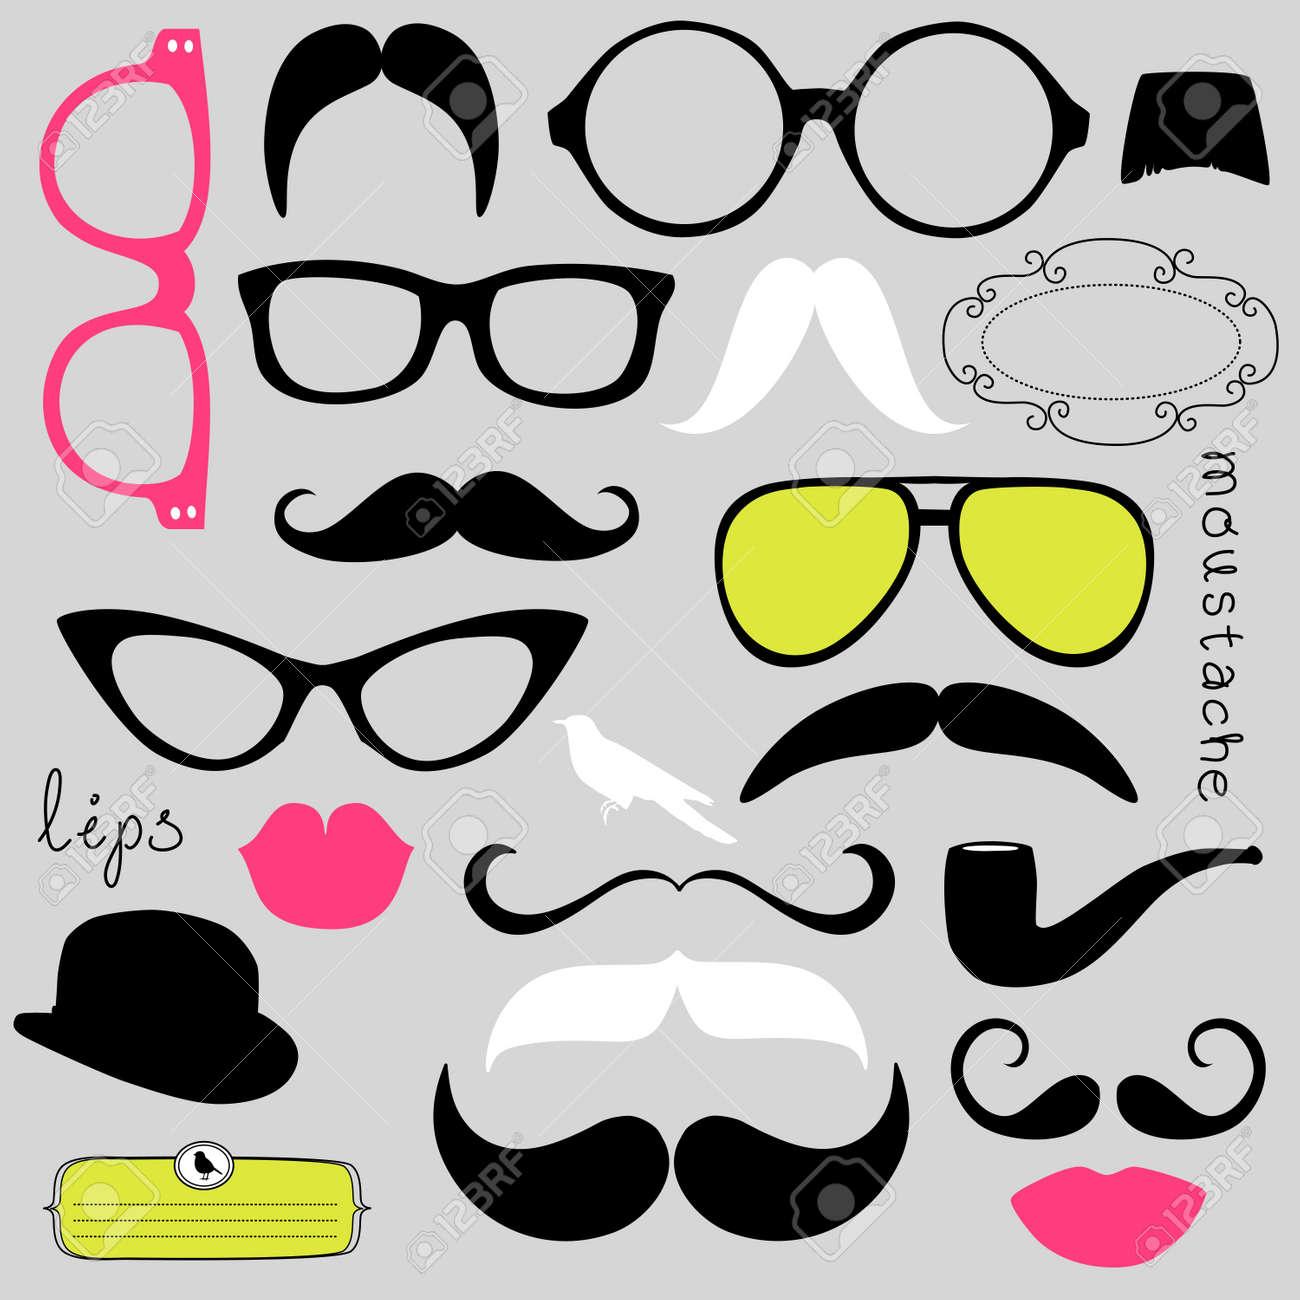 Retro Party set - Sunglasses, lips, mustaches Stock Vector - 13339730